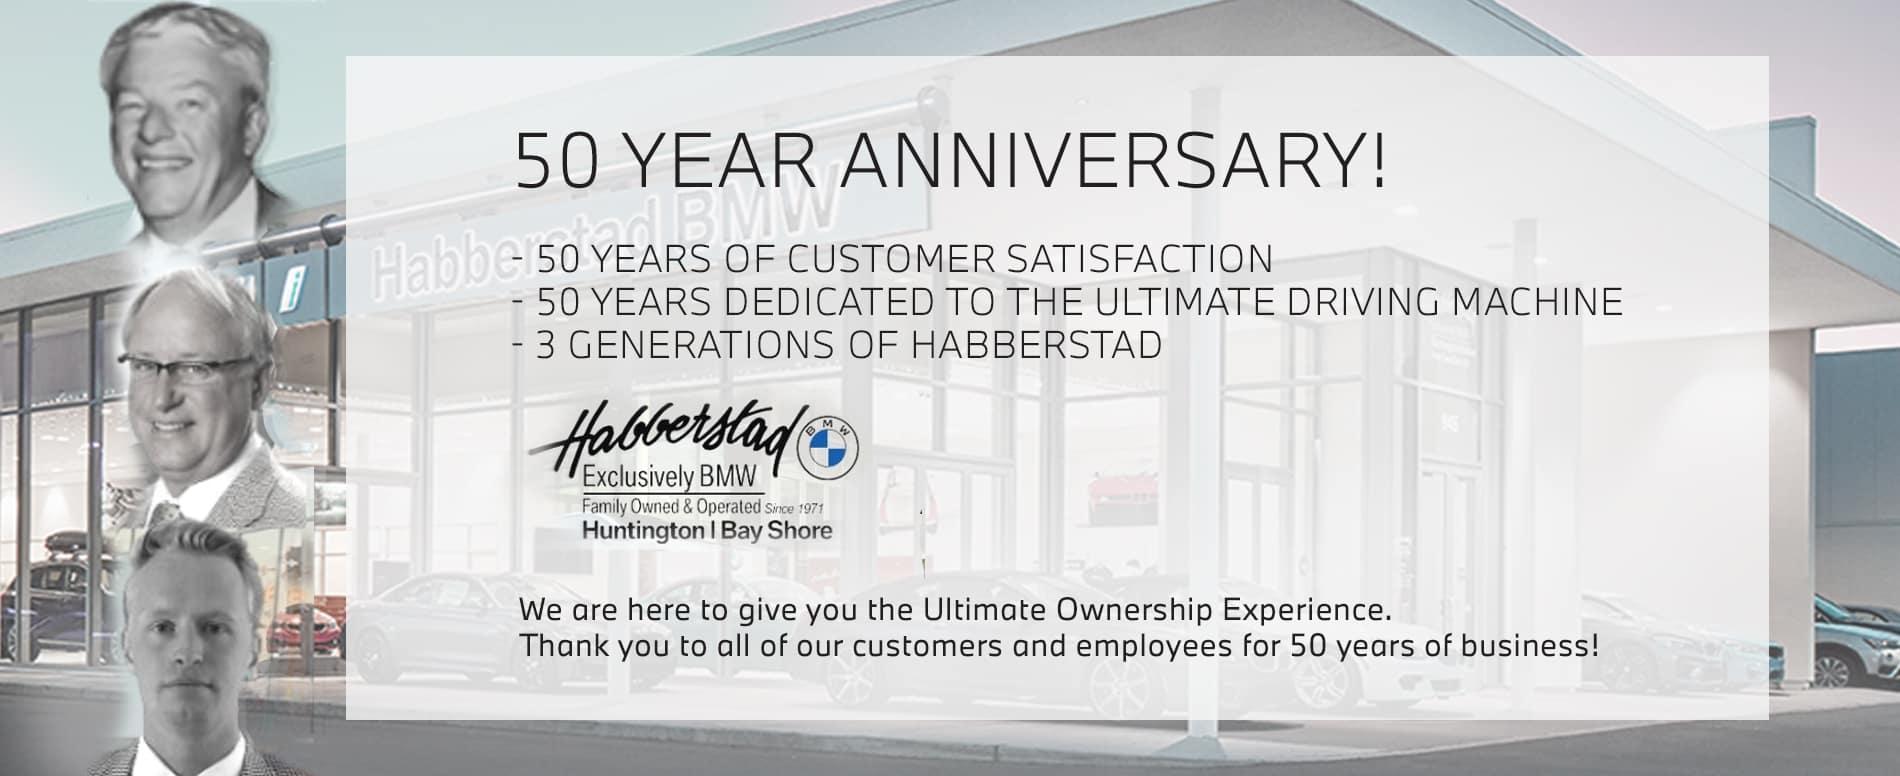 50 year anniversary celebration